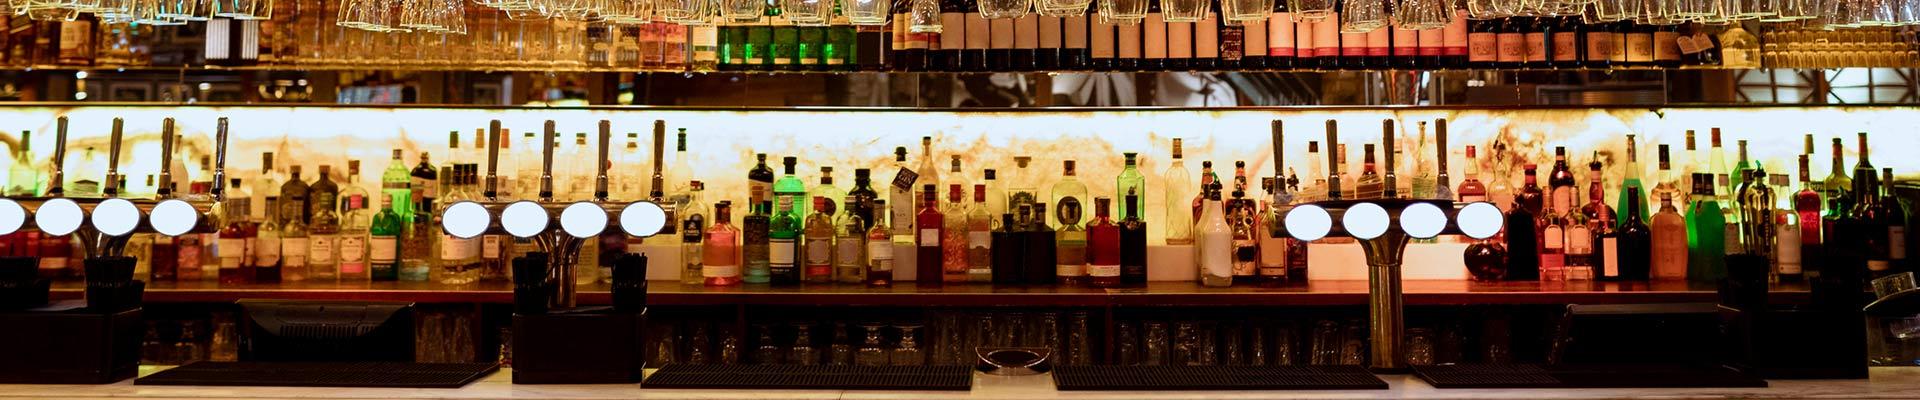 Liquor & Hospitality